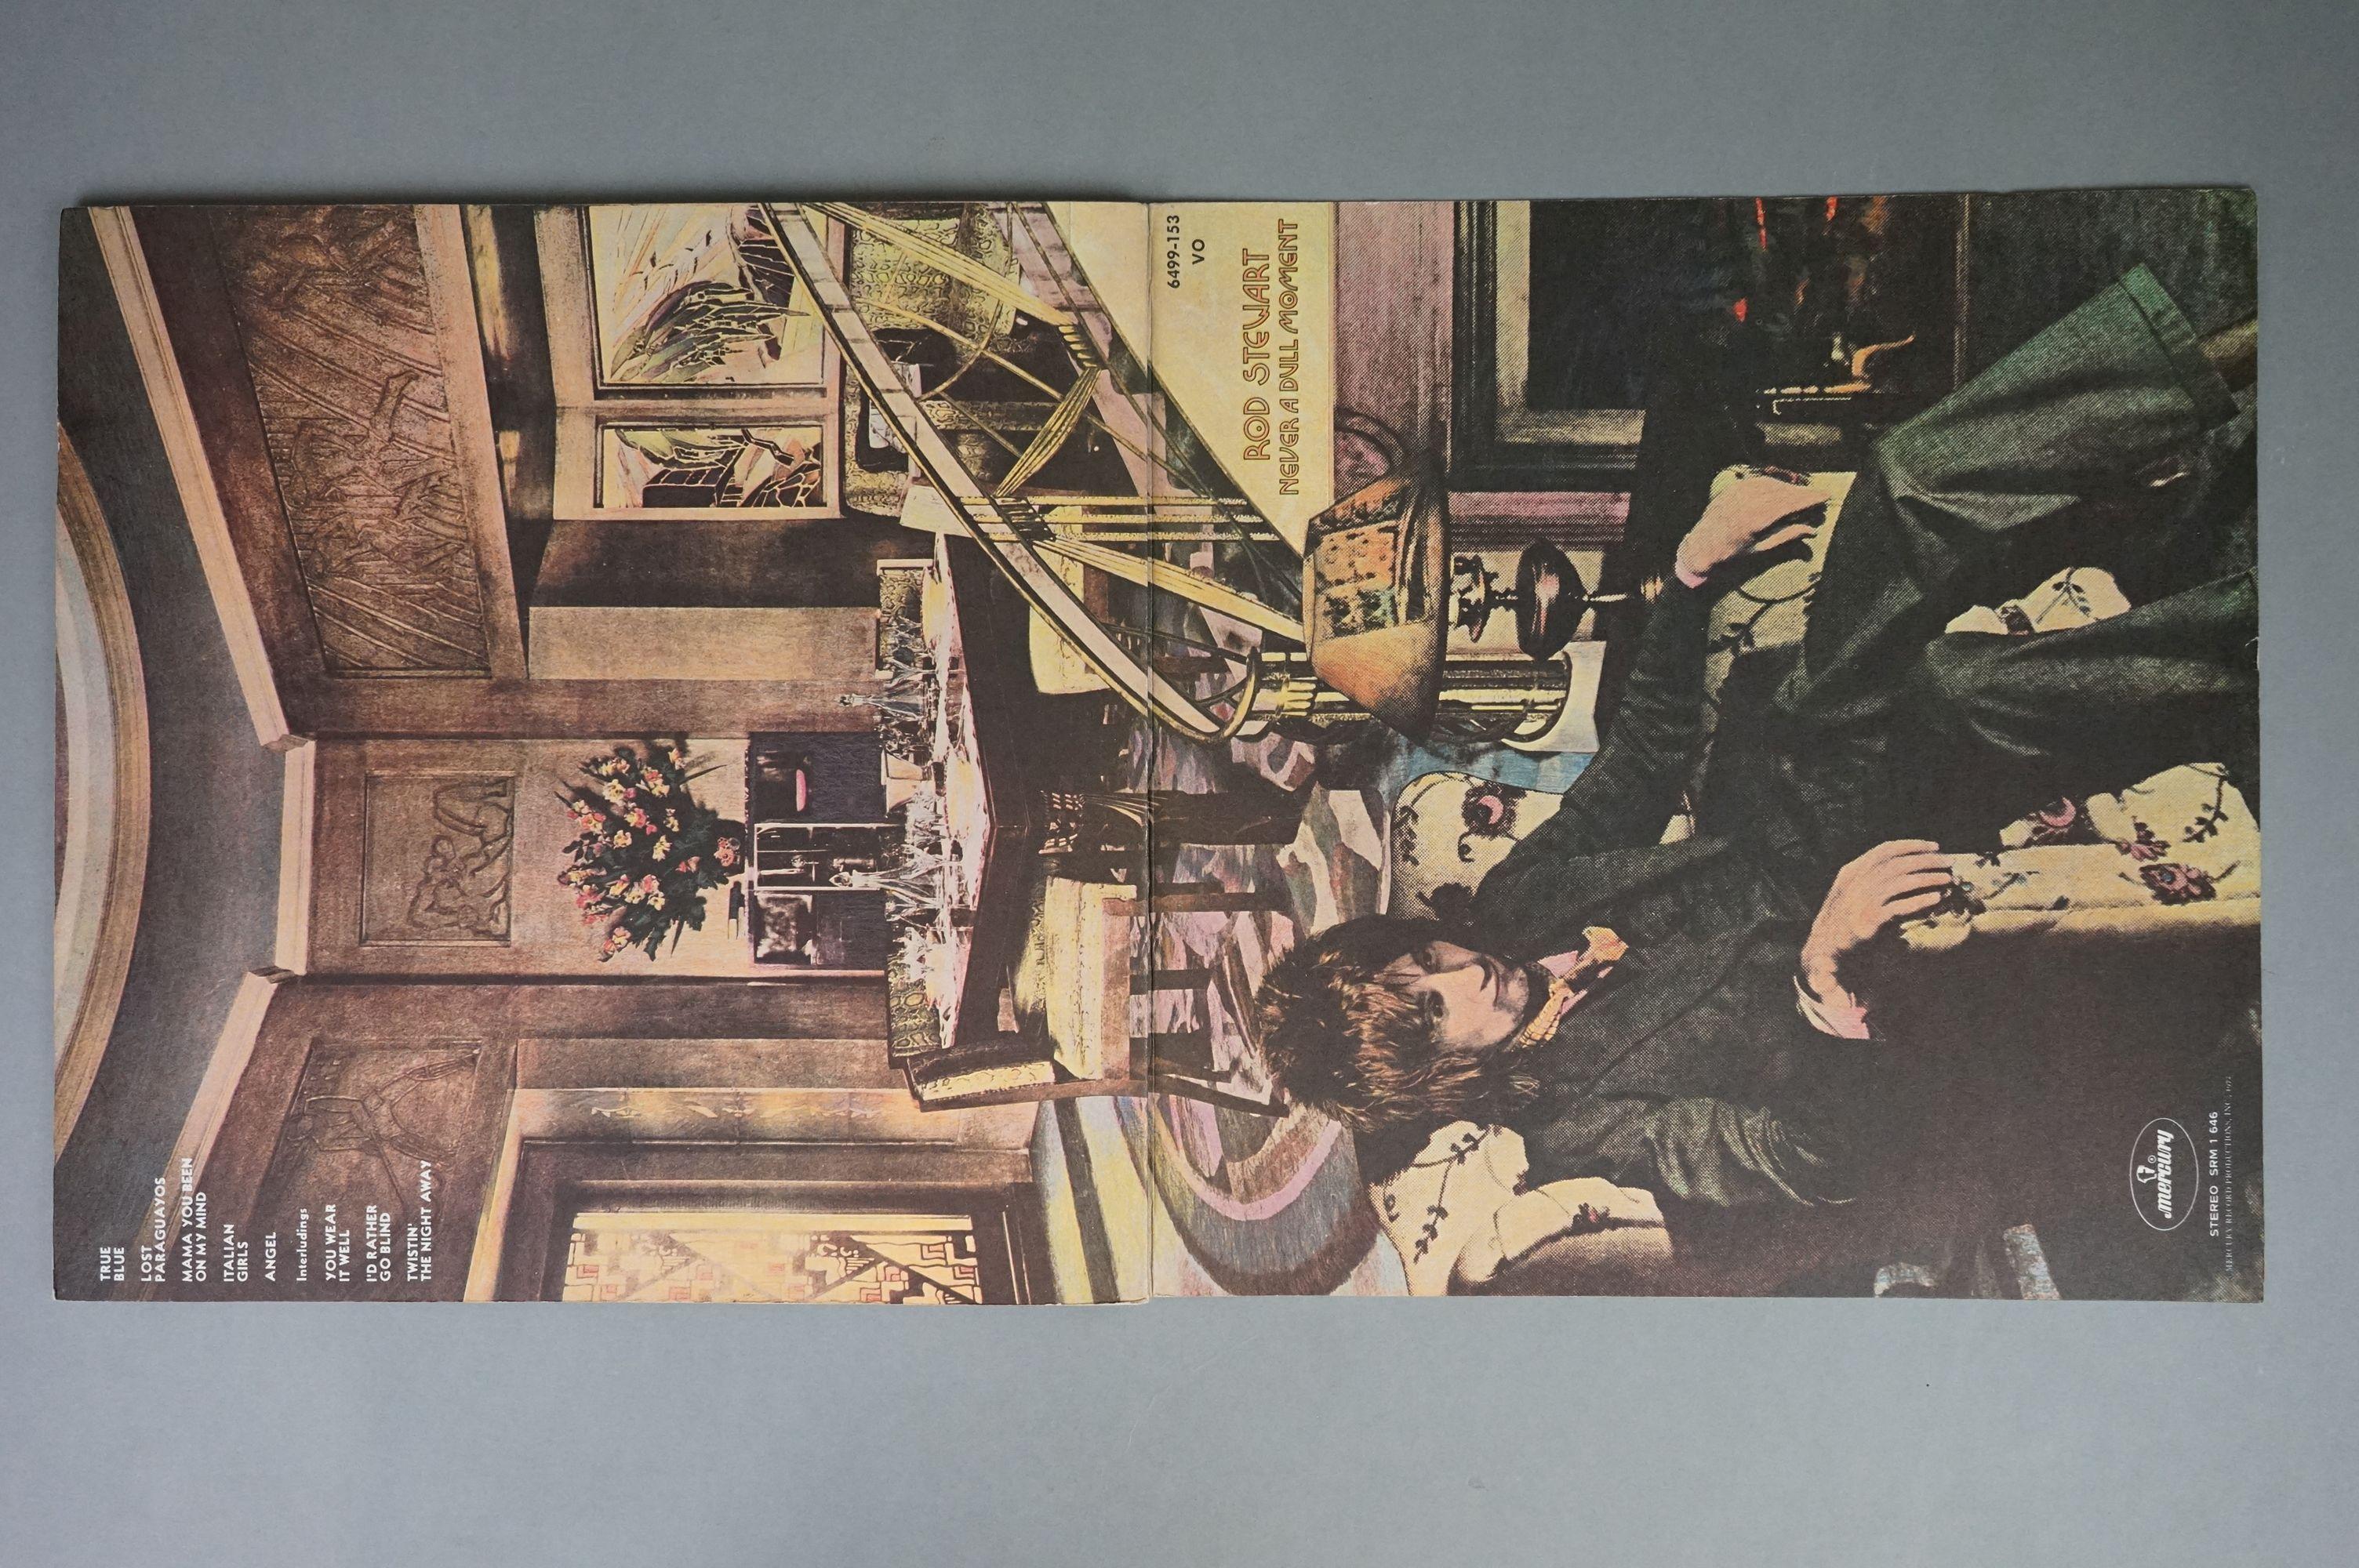 Vinyl - Rod Stewart 4 LP's to include An Old Raincoat Won't Ever Let You Down (Vertigo VO4) gatefold - Image 6 of 14